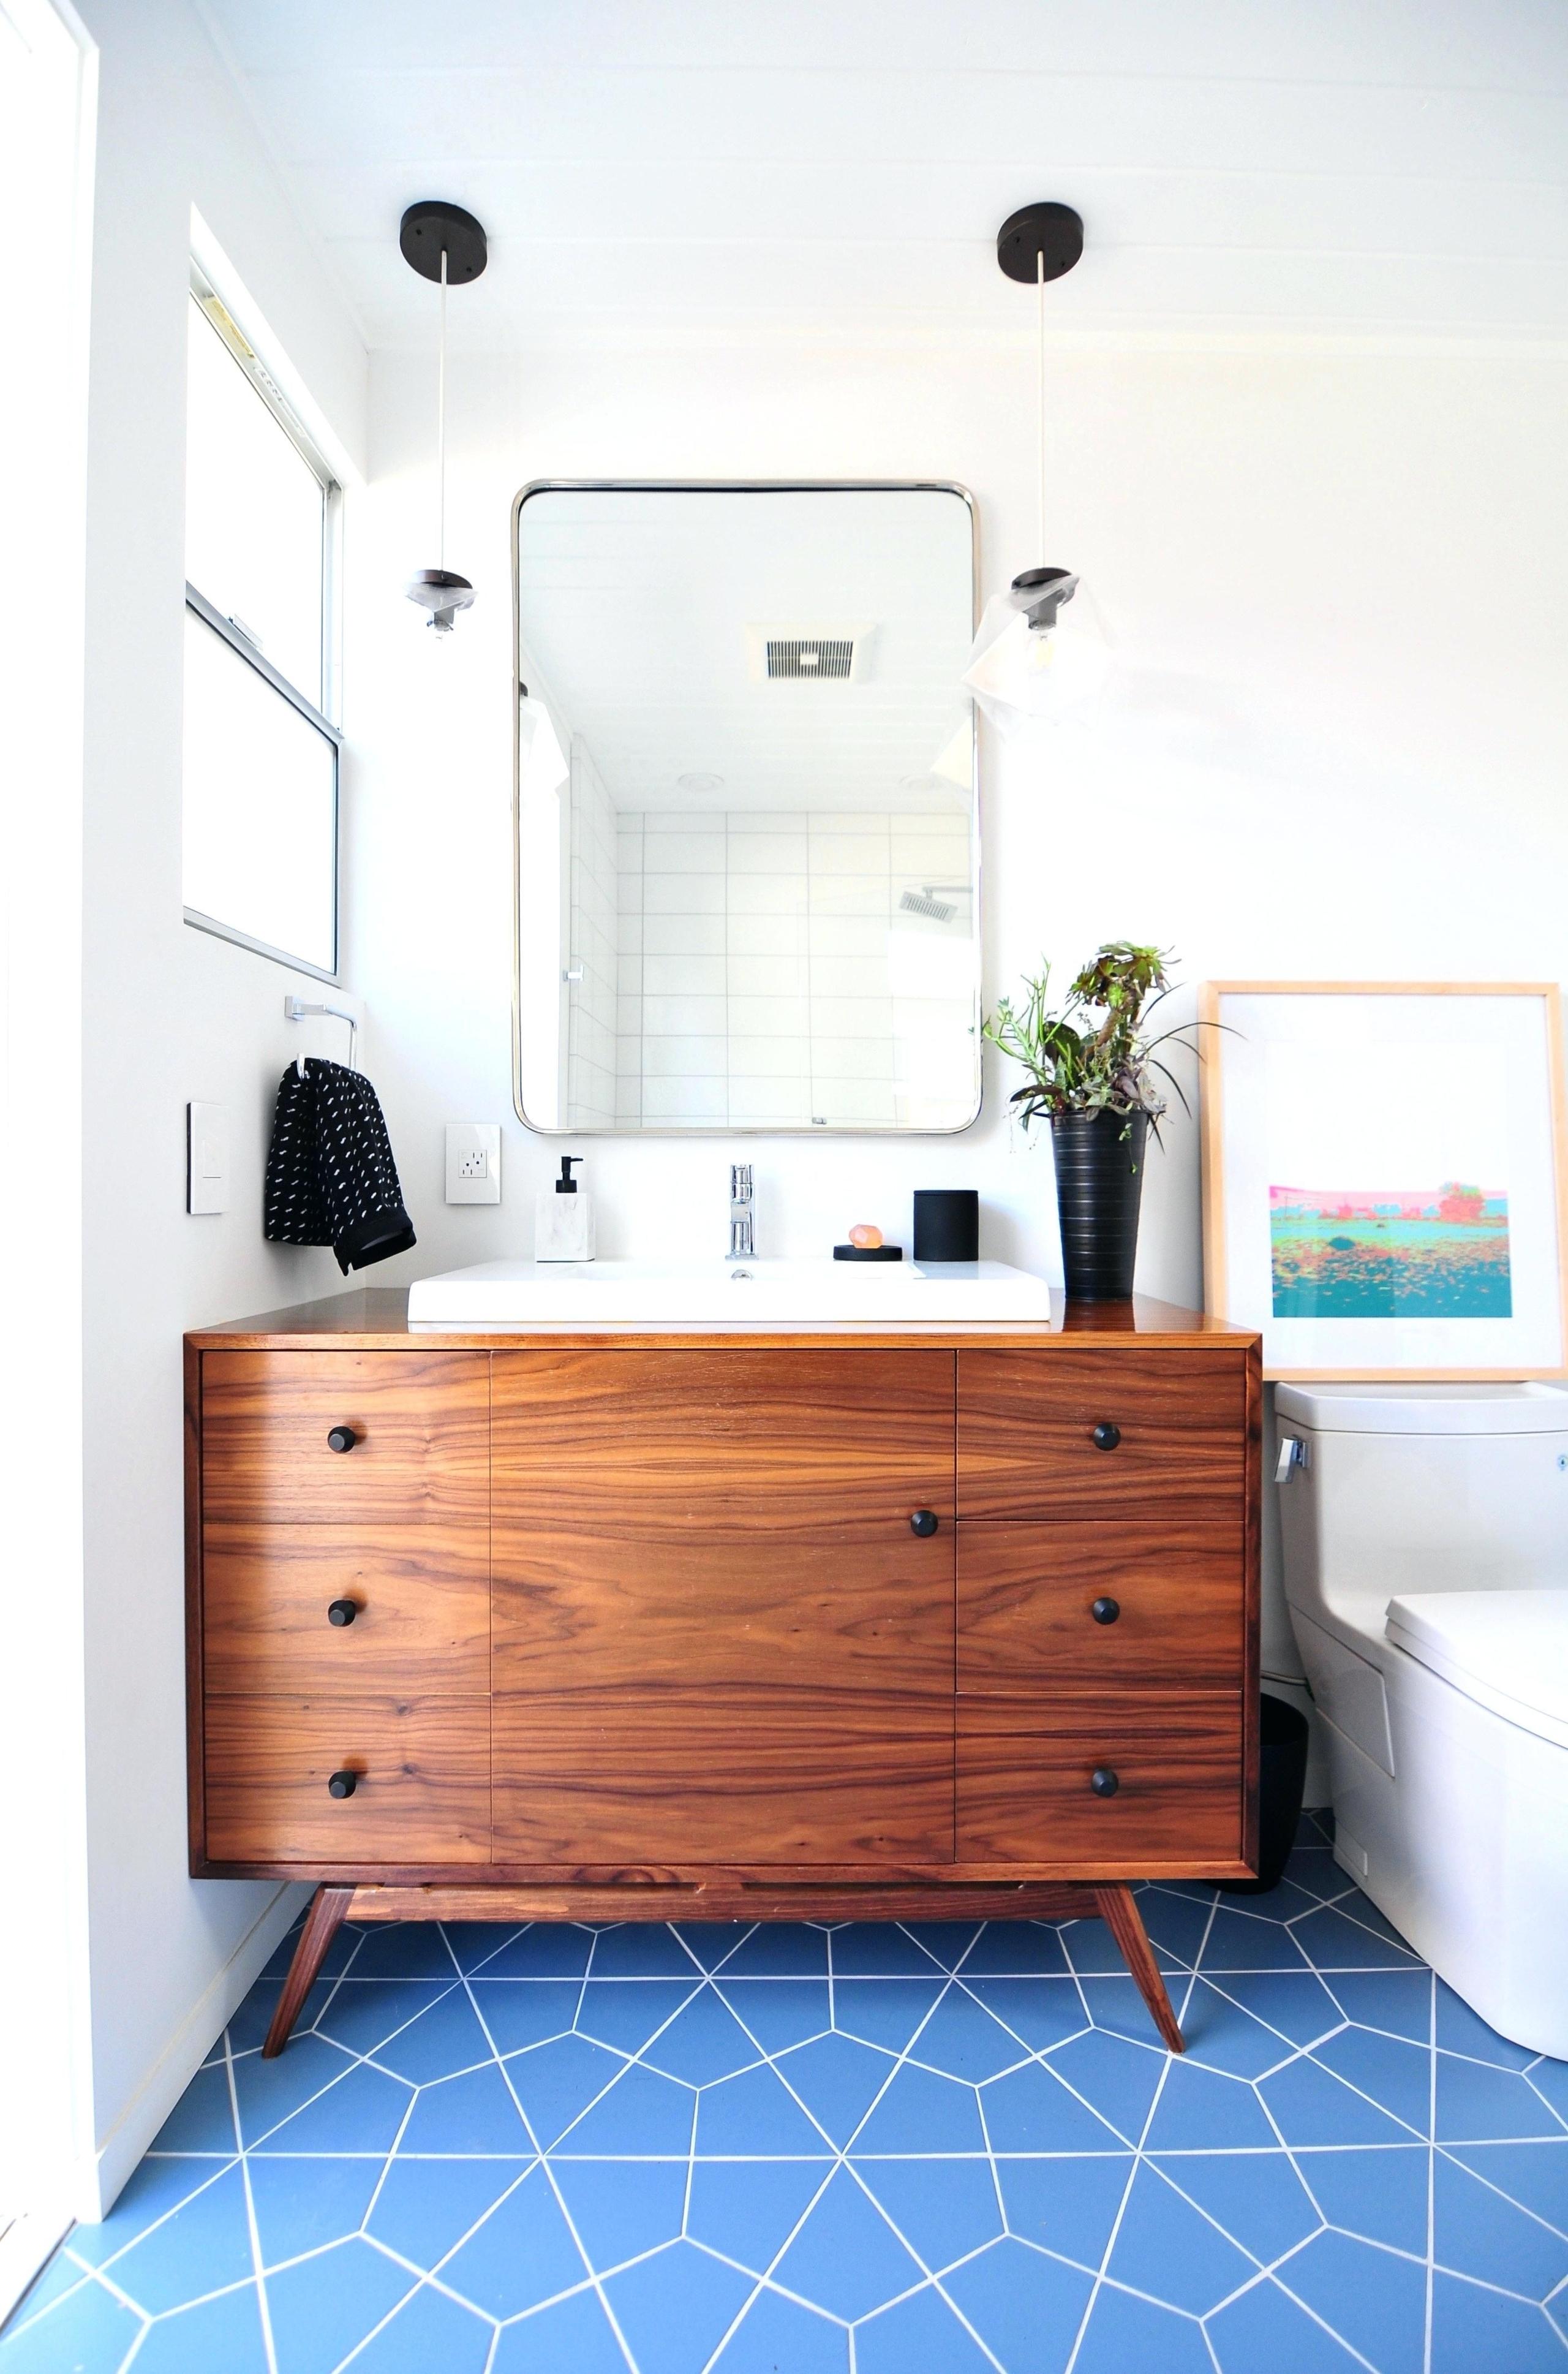 Mid Century Modern Bathroom Vanity You Ll Love In 2021 Visualhunt